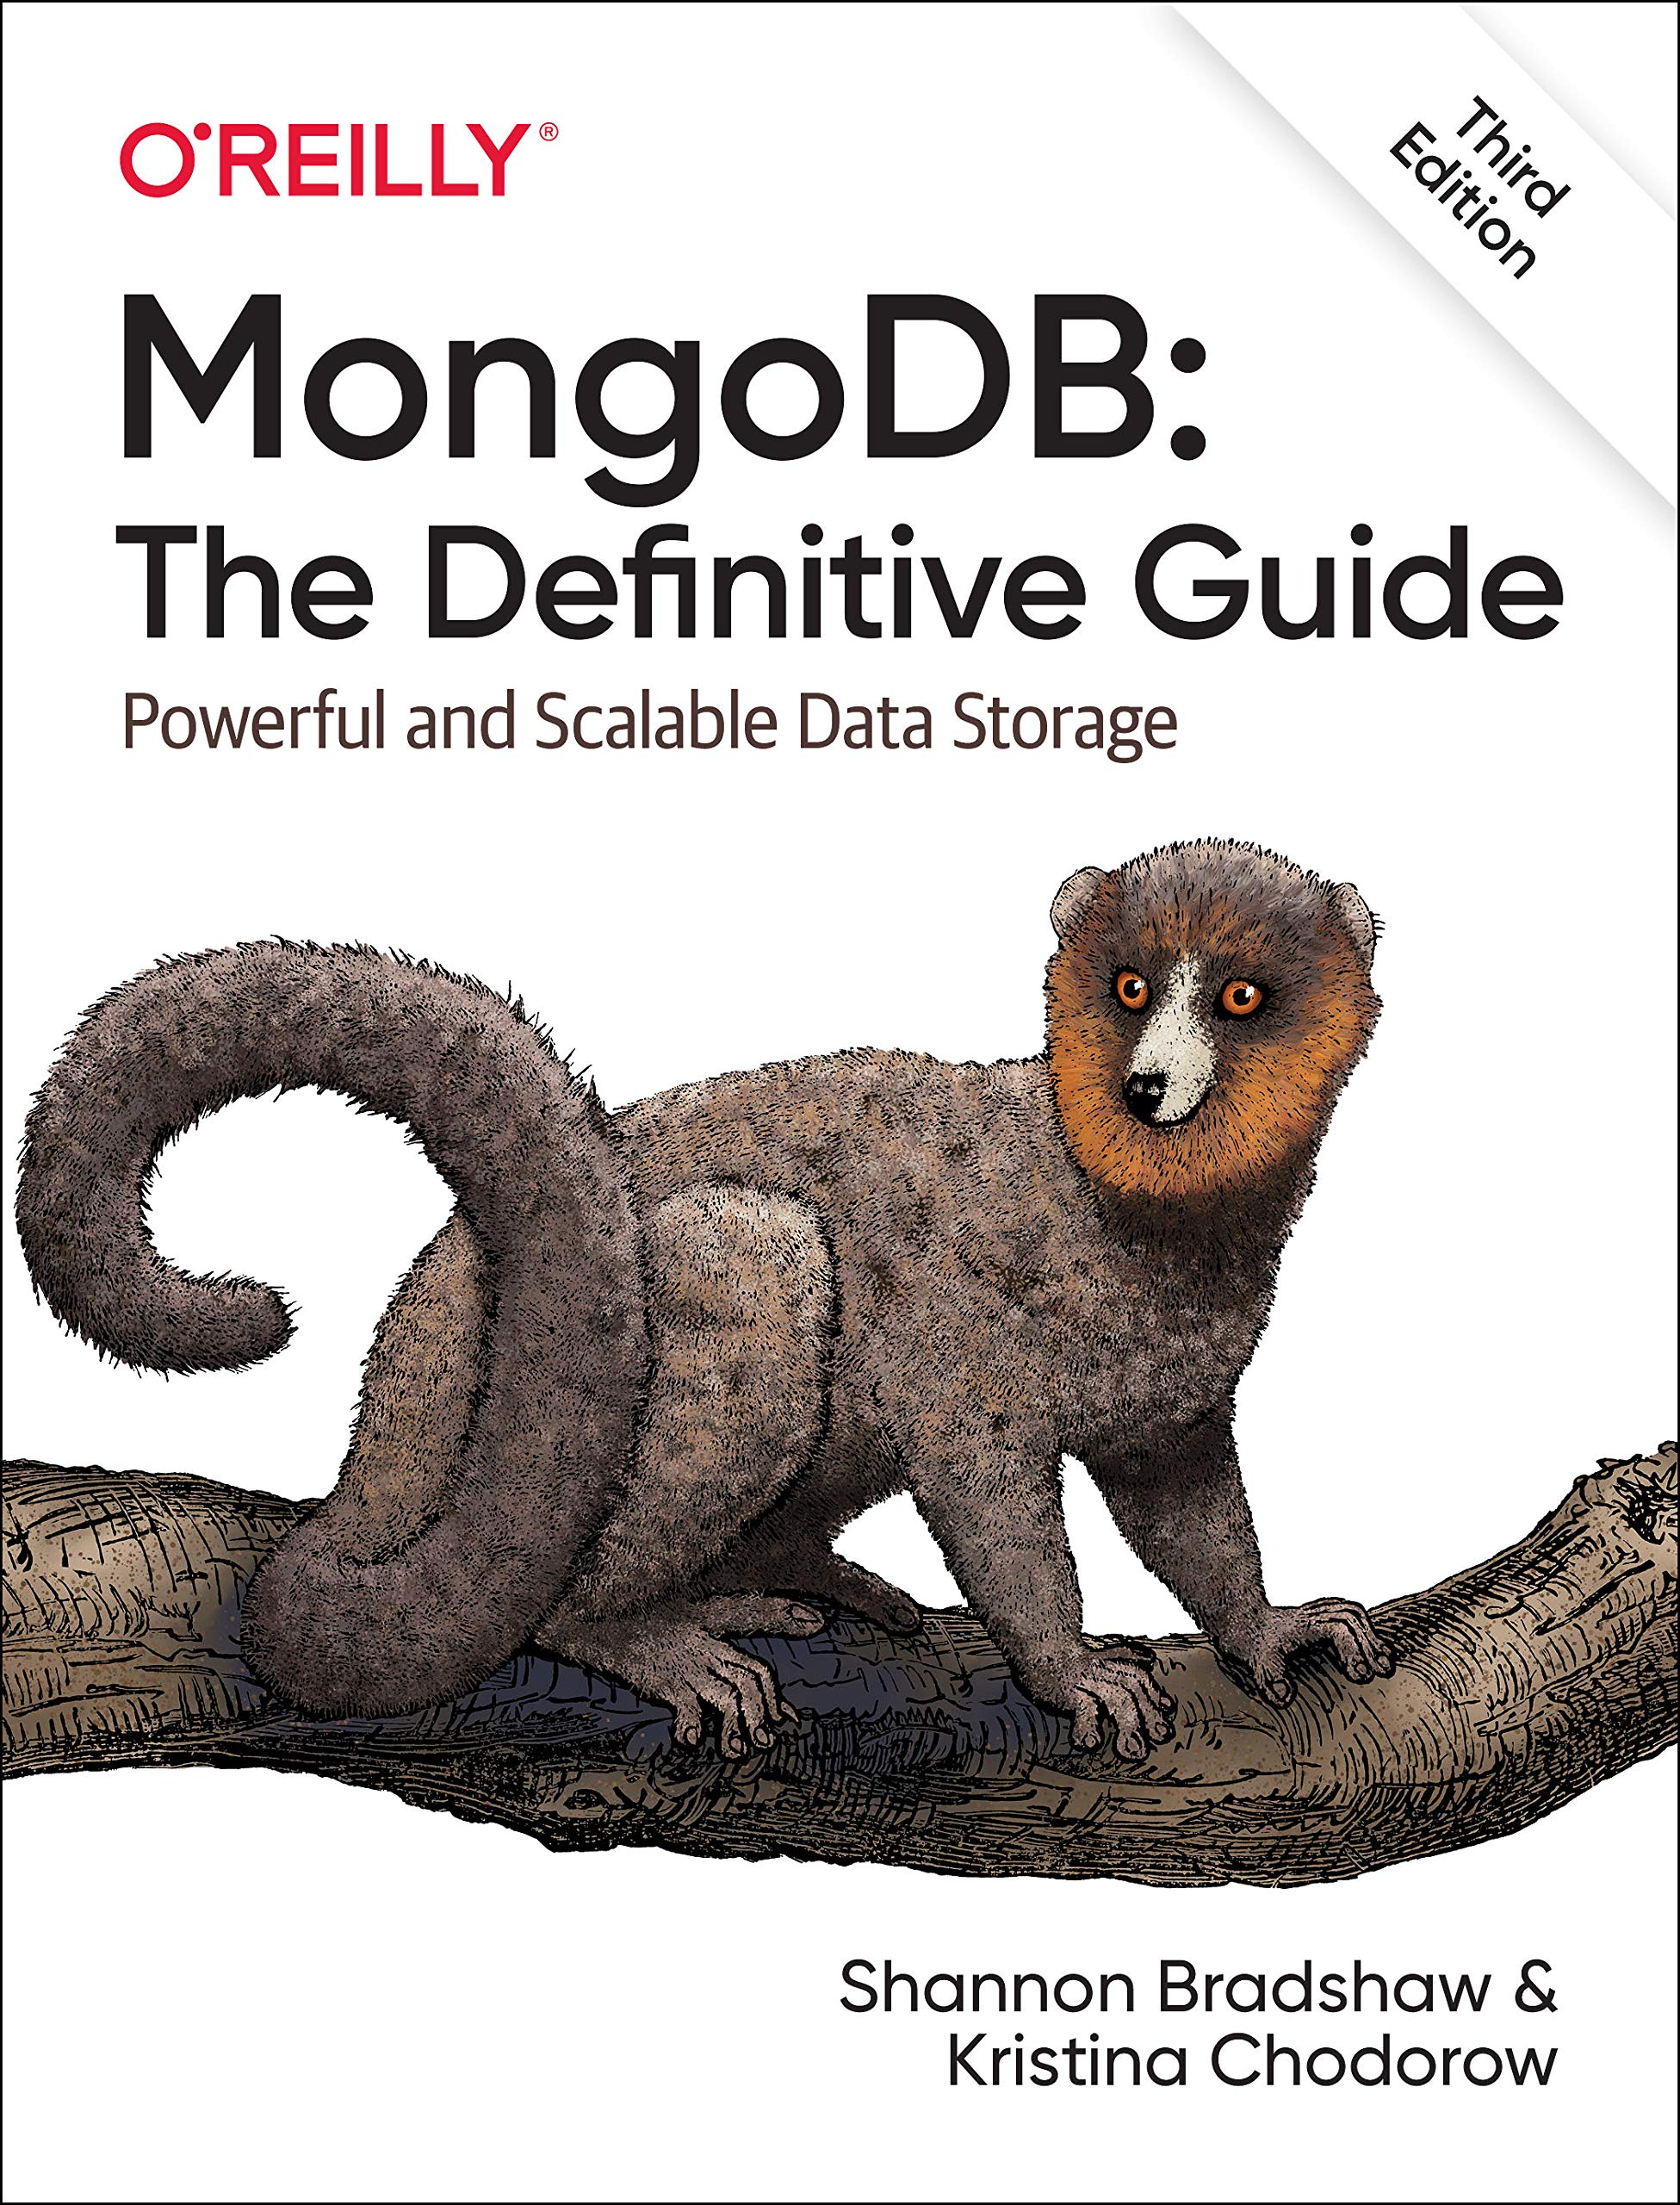 MongoDB: The Definitive Guide 3e Paperback – Import, 31 Aug 2019